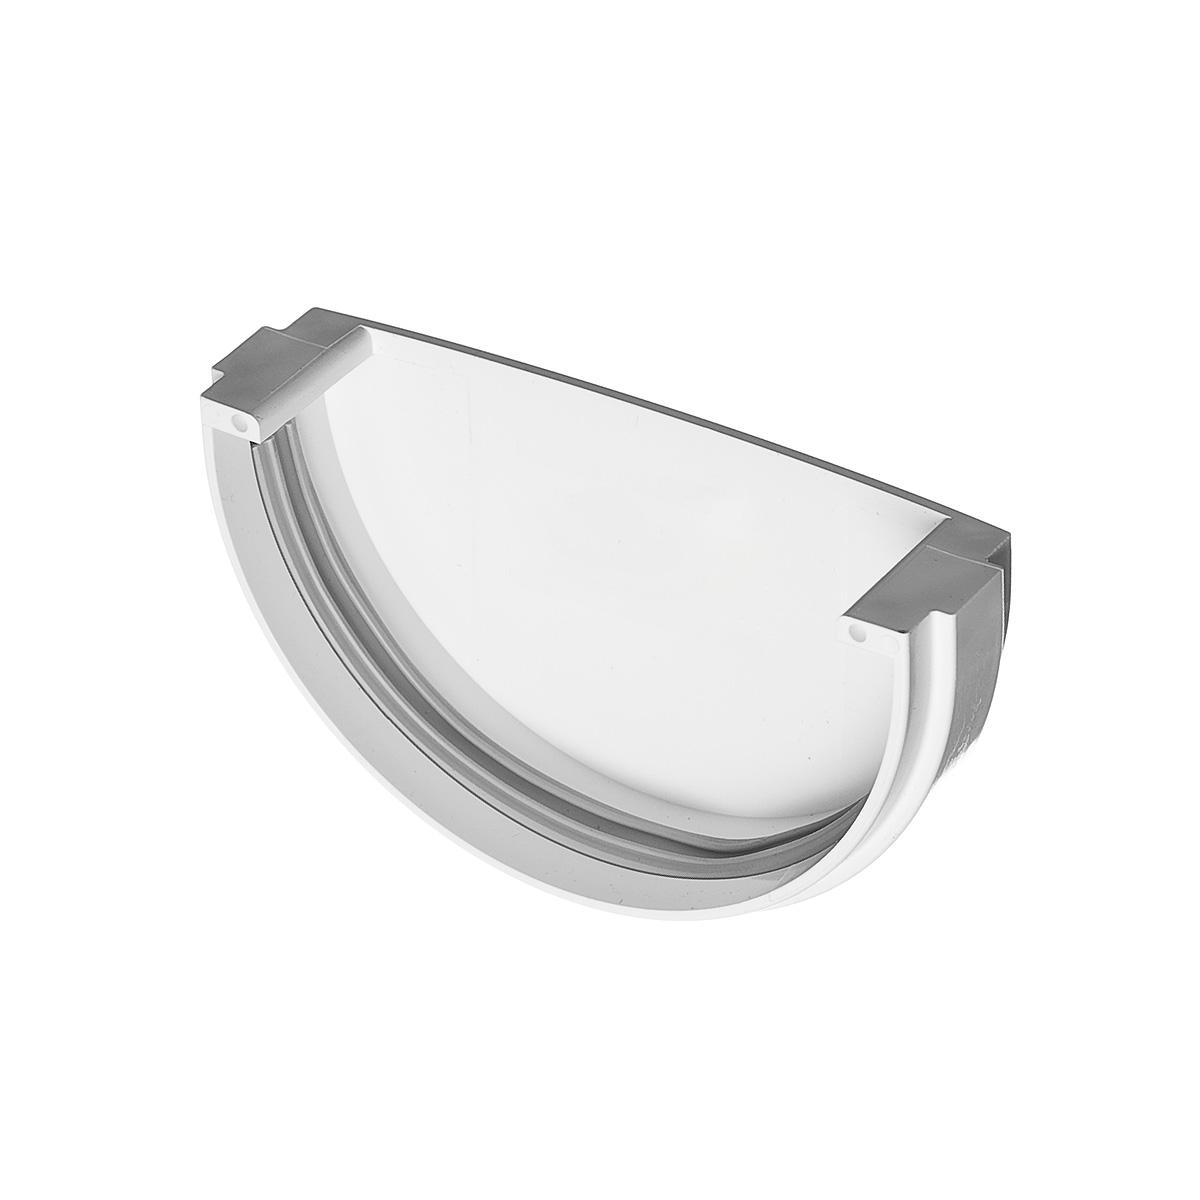 Заглушка желоба пластиковая универсальная белая VINYL-ON